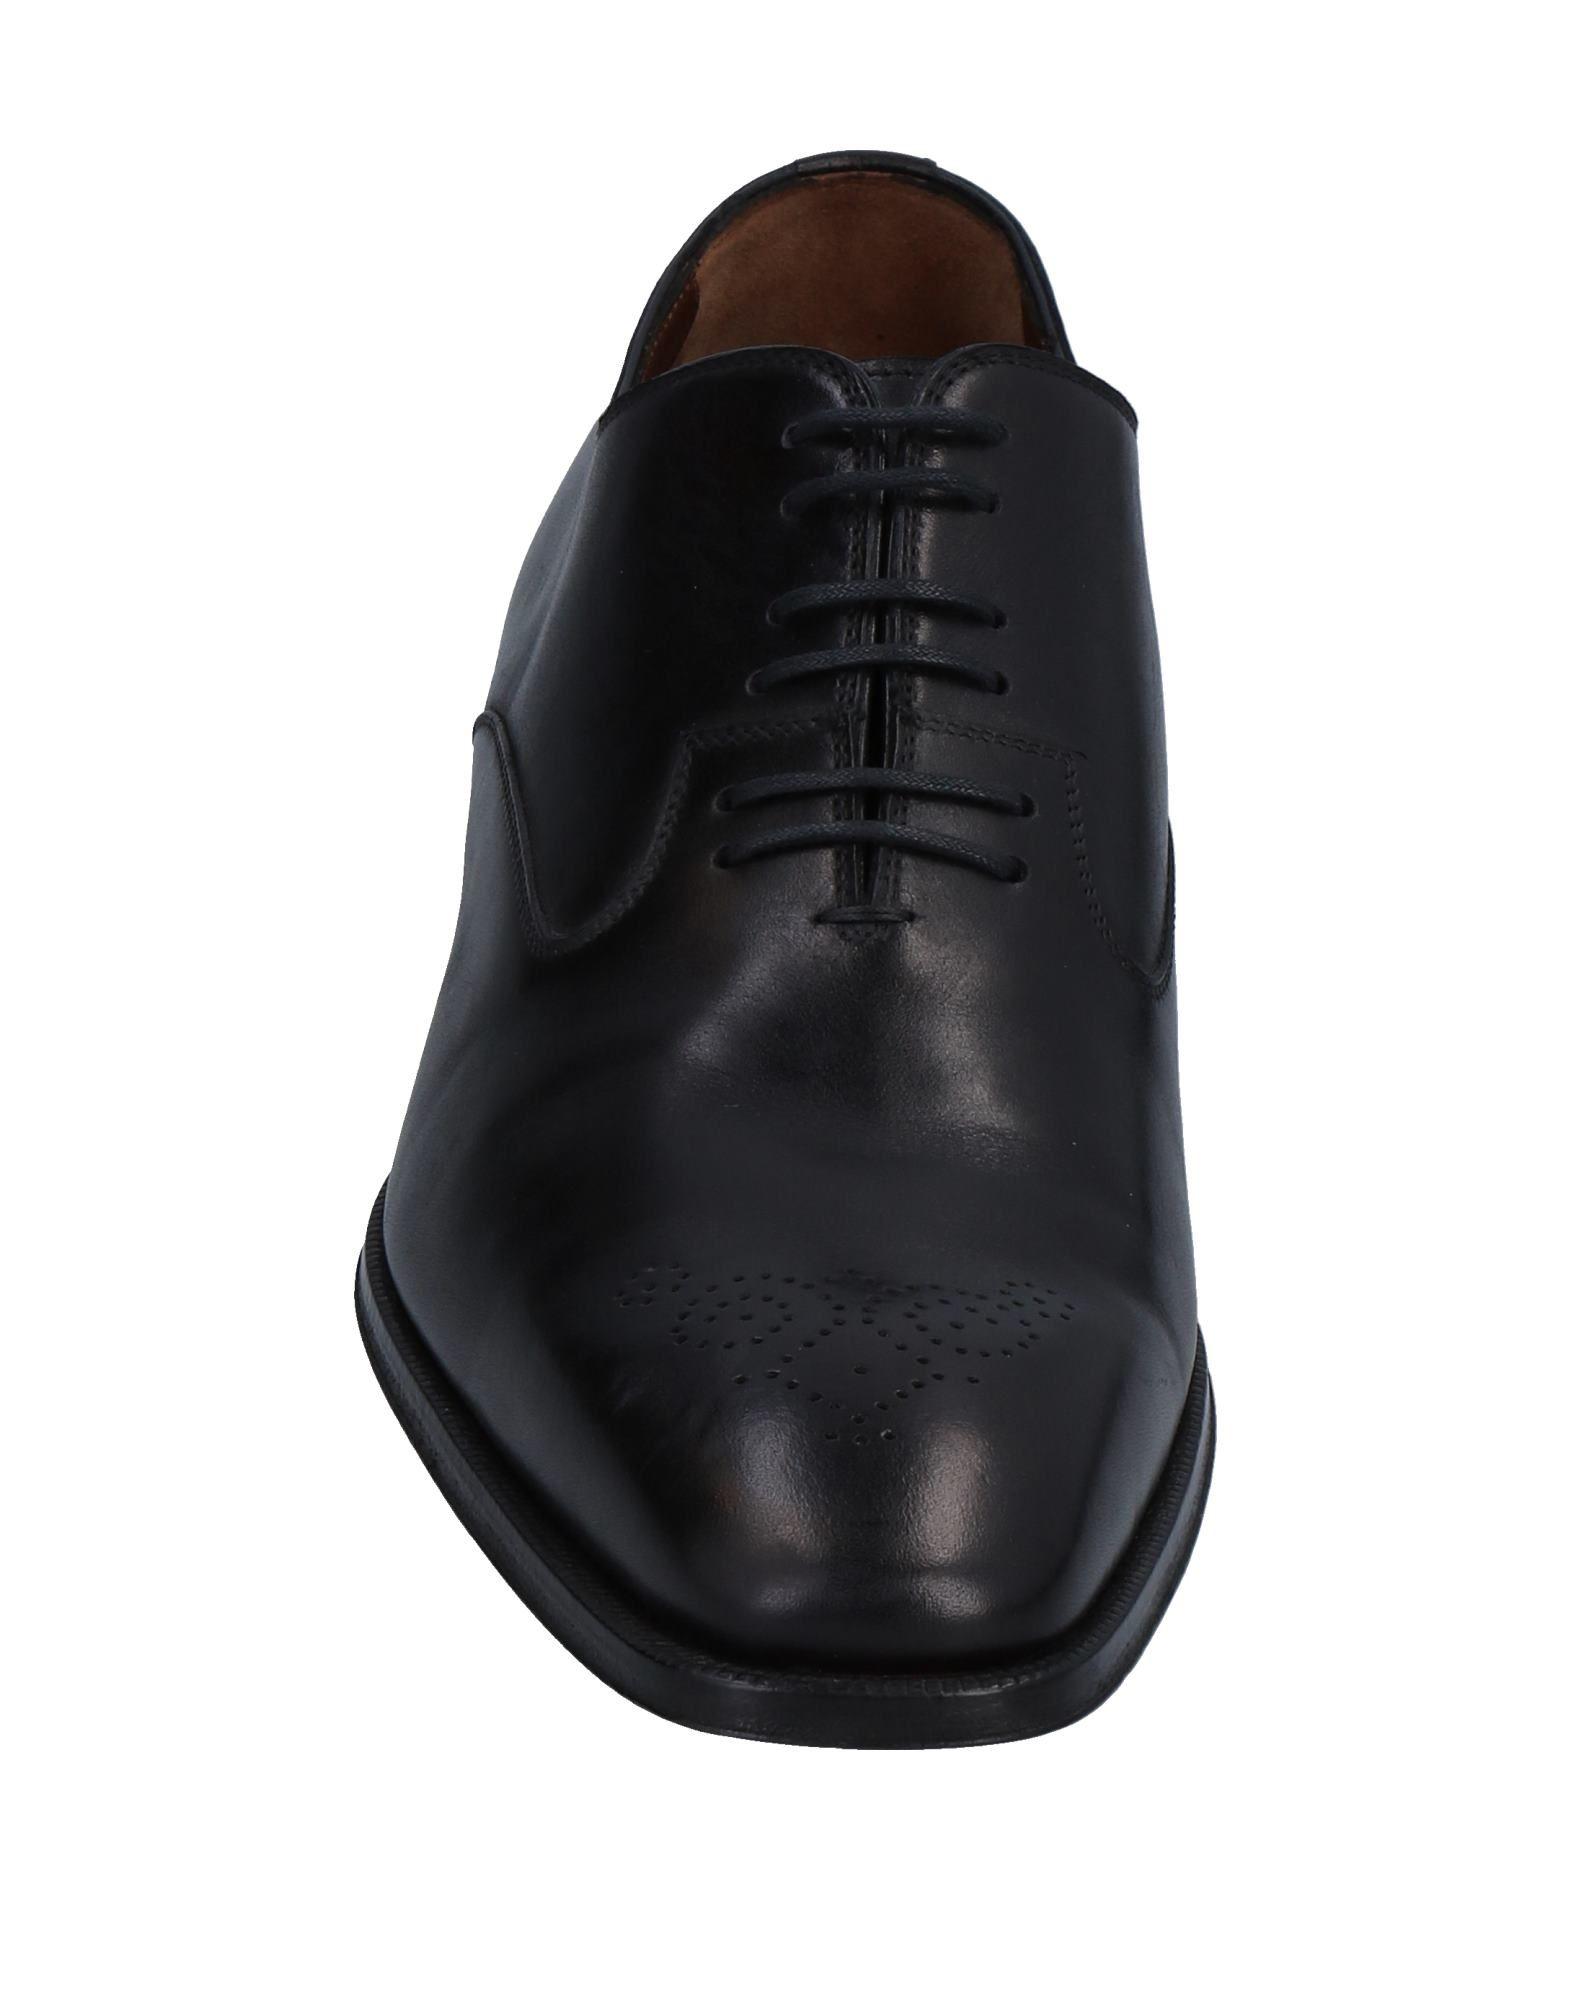 Sutor 11534390NX Mantellassi Schnürschuhe Herren  11534390NX Sutor Neue Schuhe dcb25b